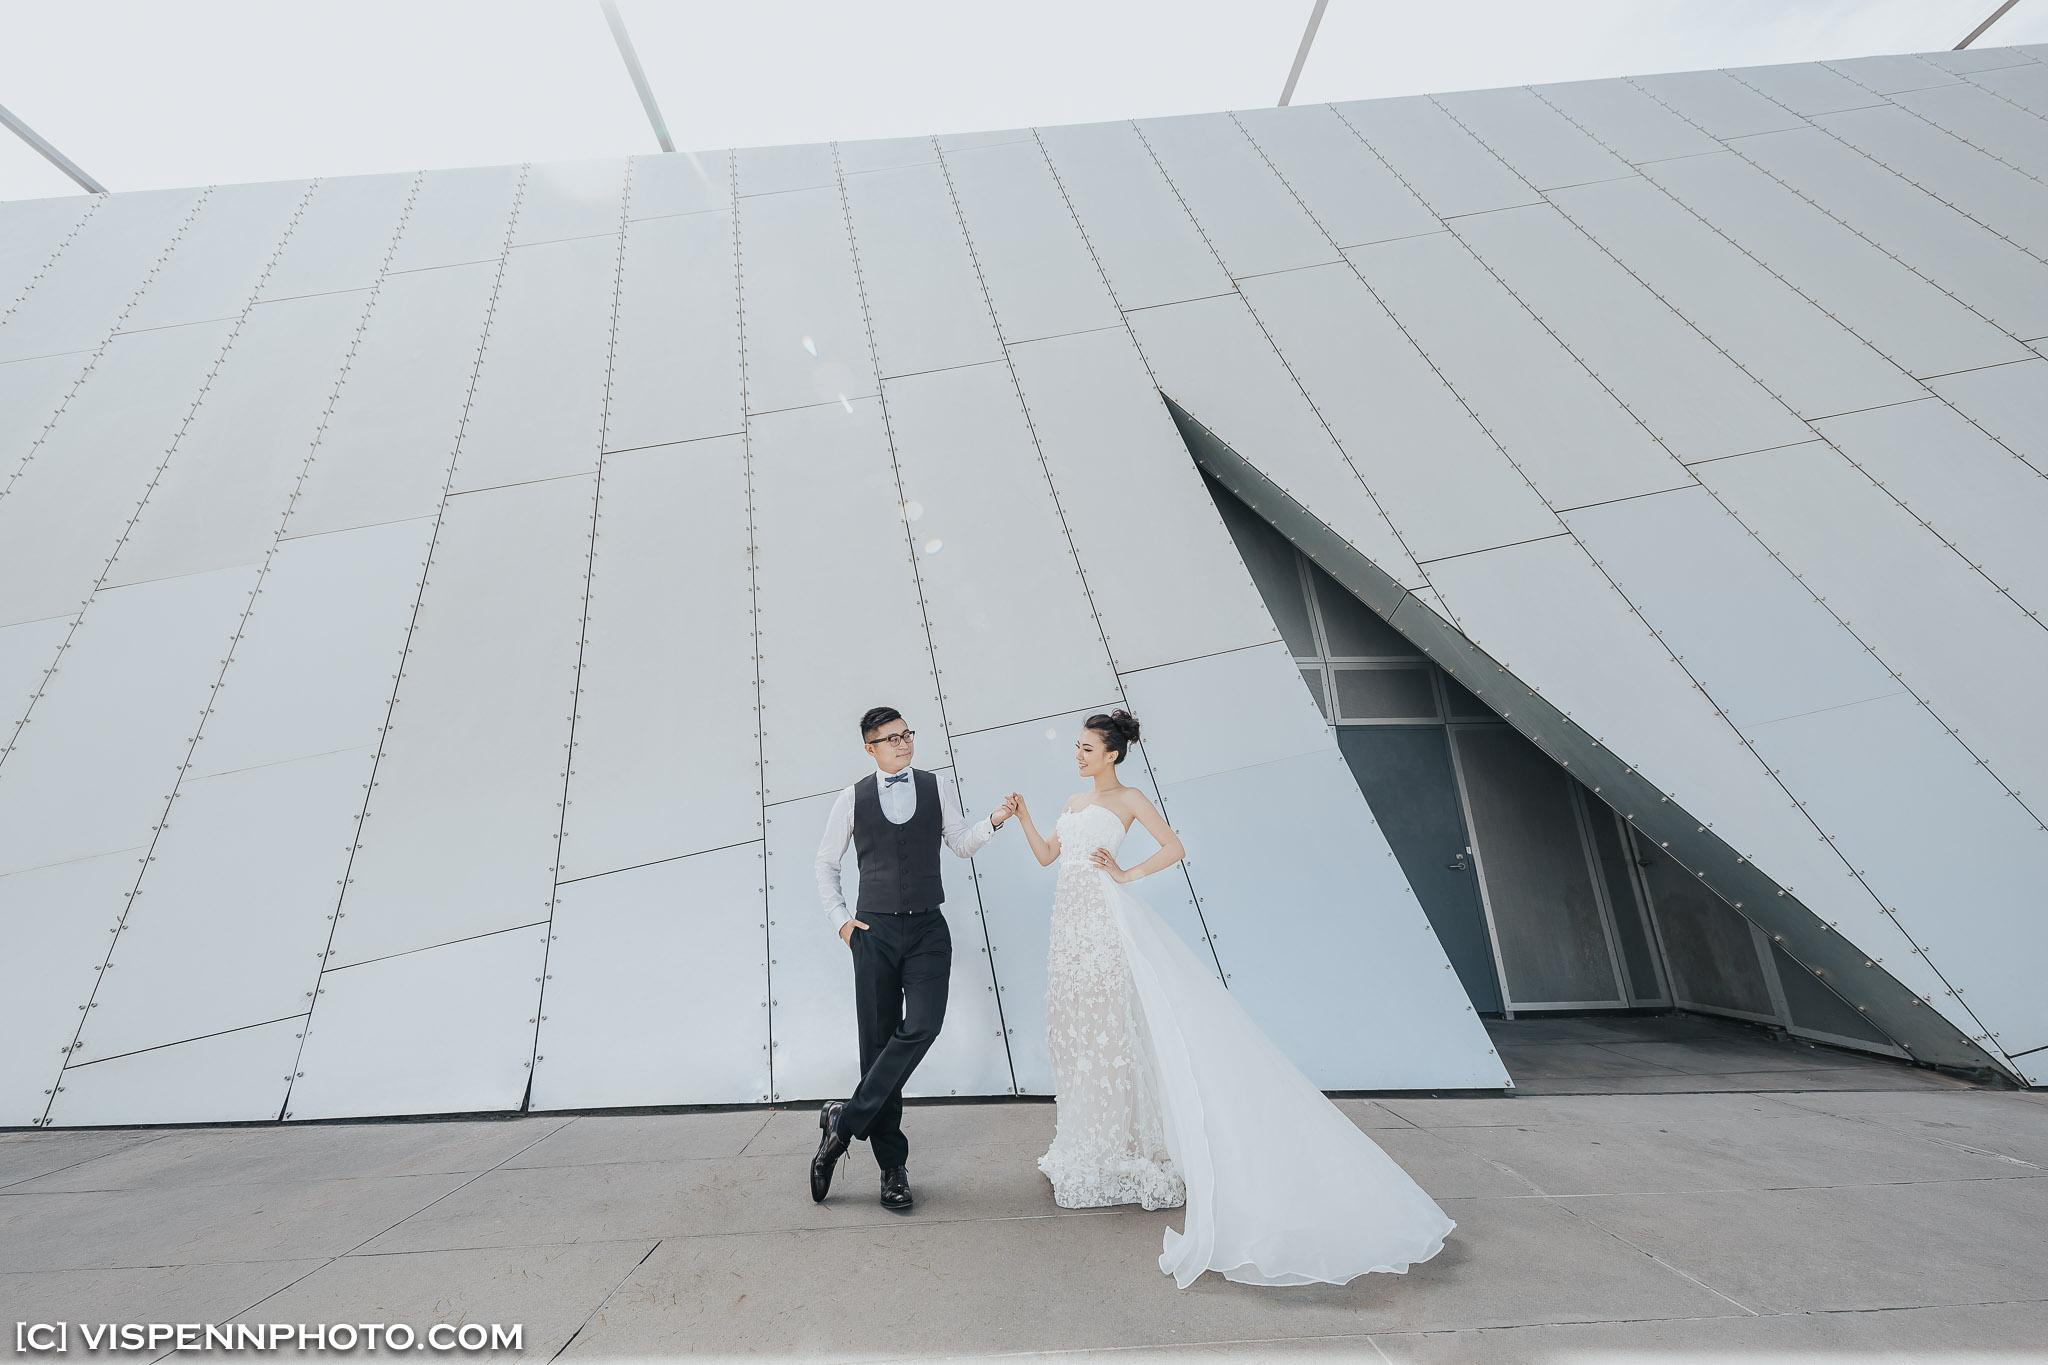 PRE WEDDING Photography Melbourne VISPENN 墨尔本 婚纱照 结婚照 婚纱摄影 VISPENN StacieYi PreWedding 4978